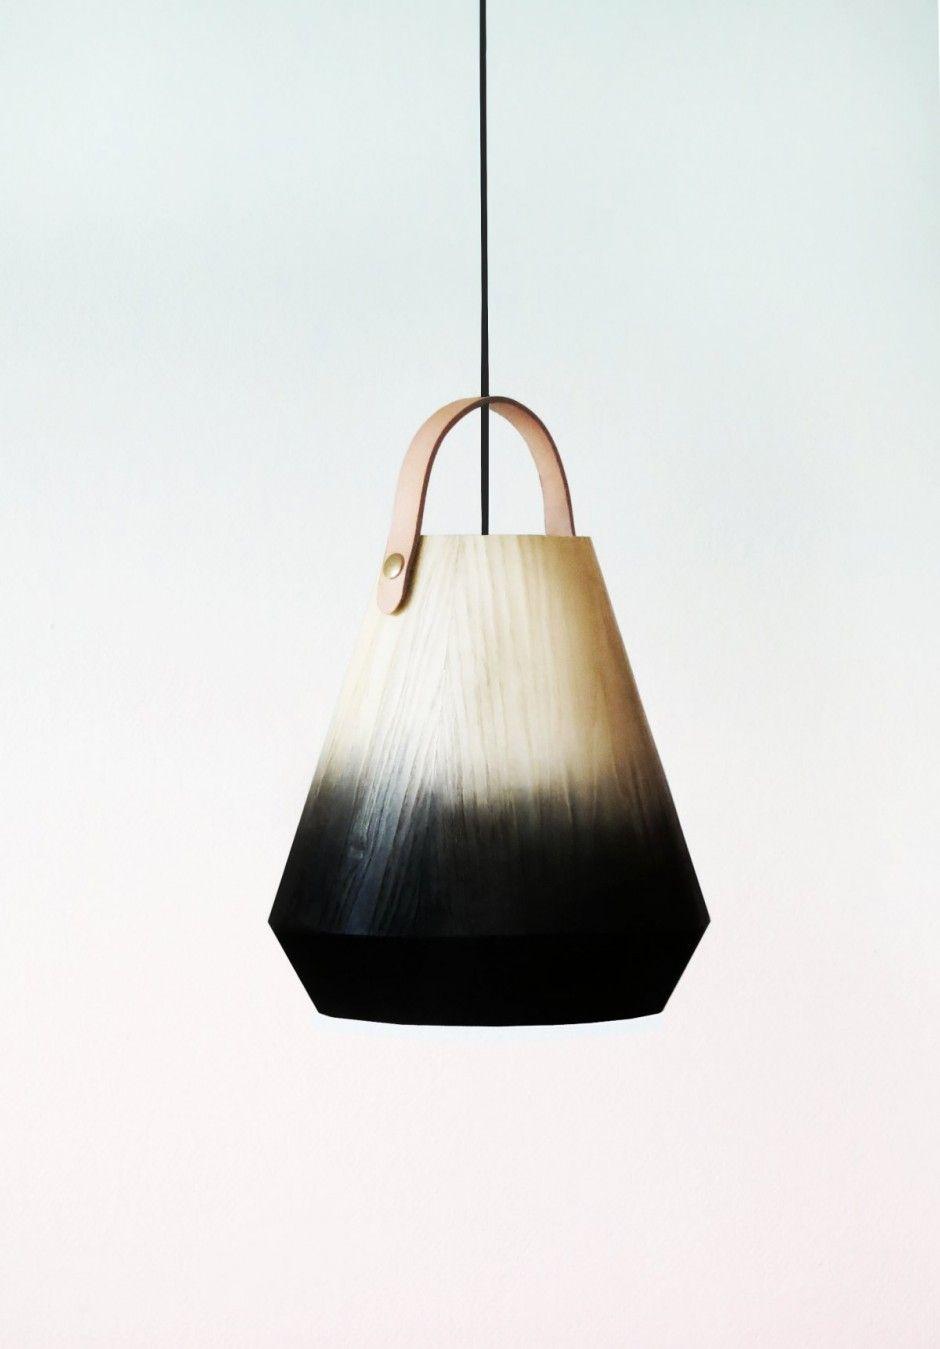 Pin by Julie N. Wickersham on madeira   Lamp, Furniture